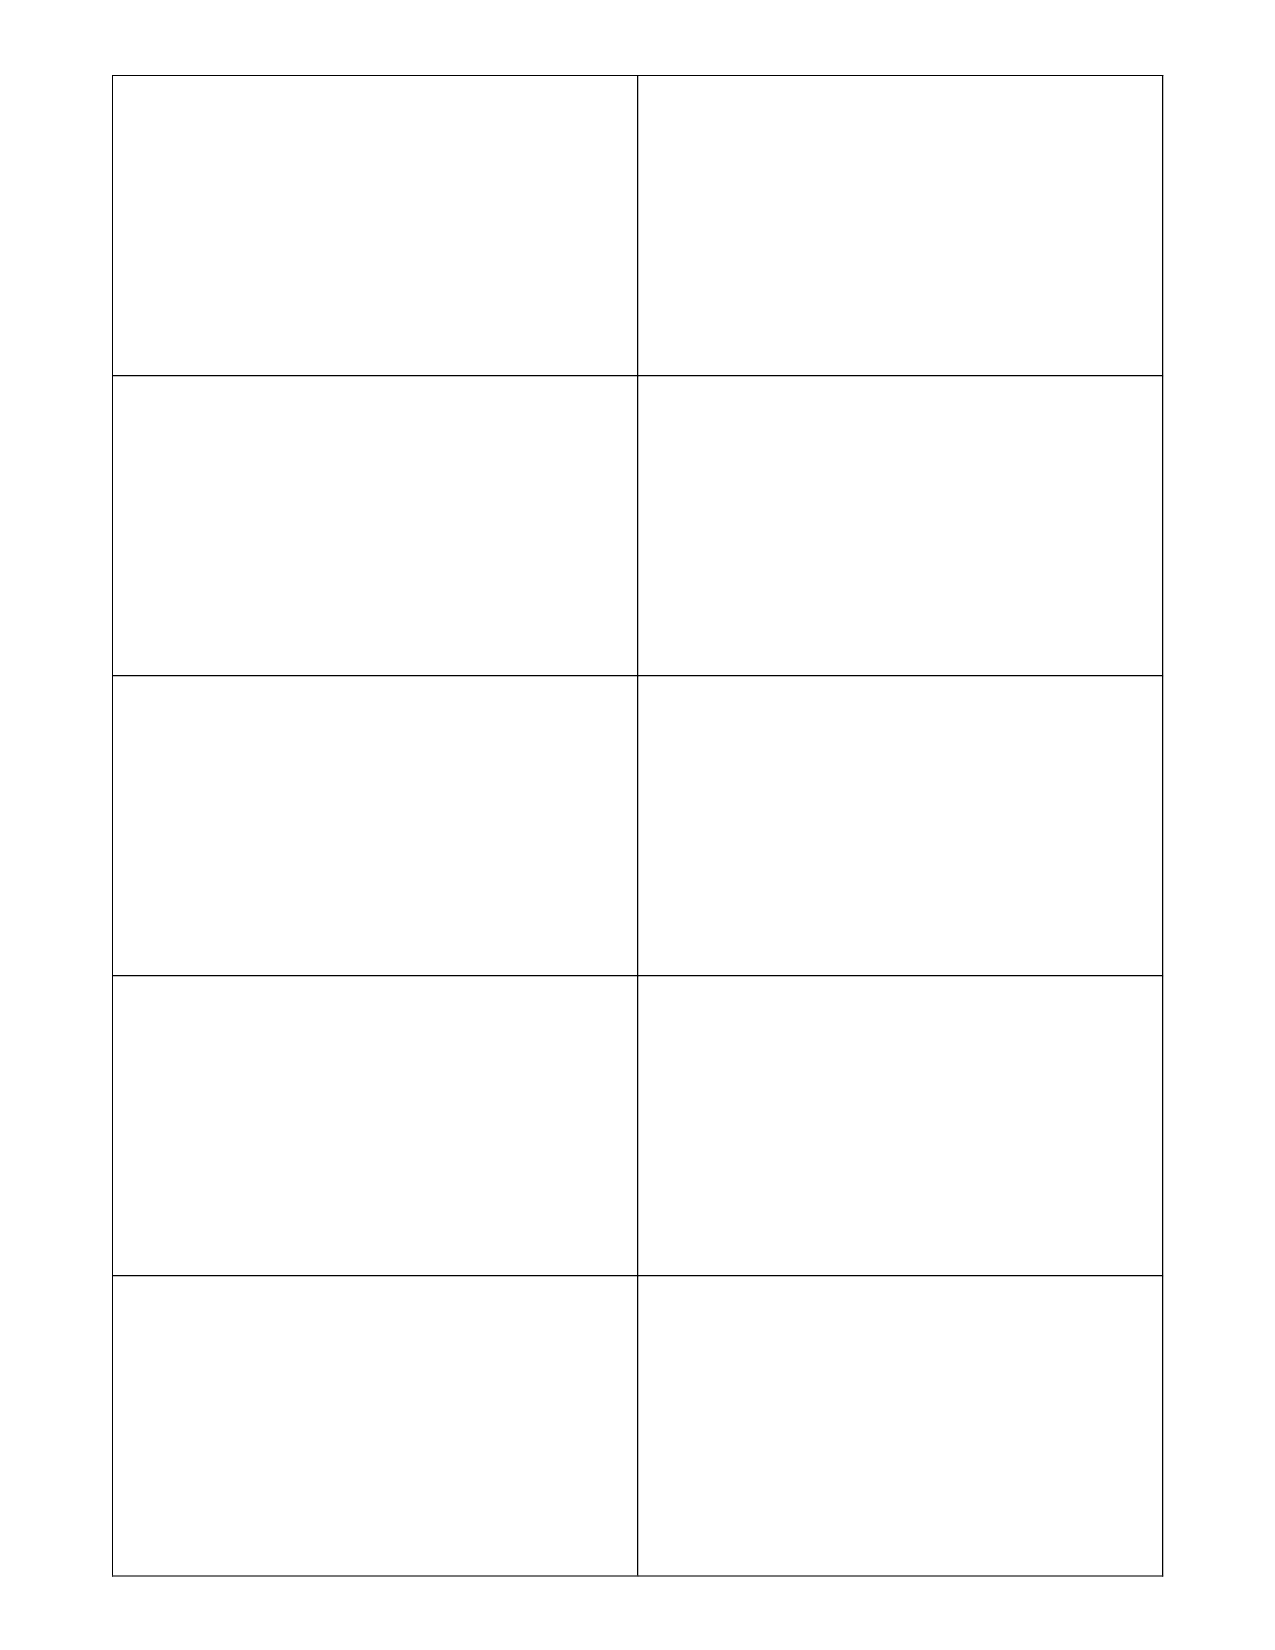 Blank card template solarfm it business card template 28 images 30 psd business accmission Images